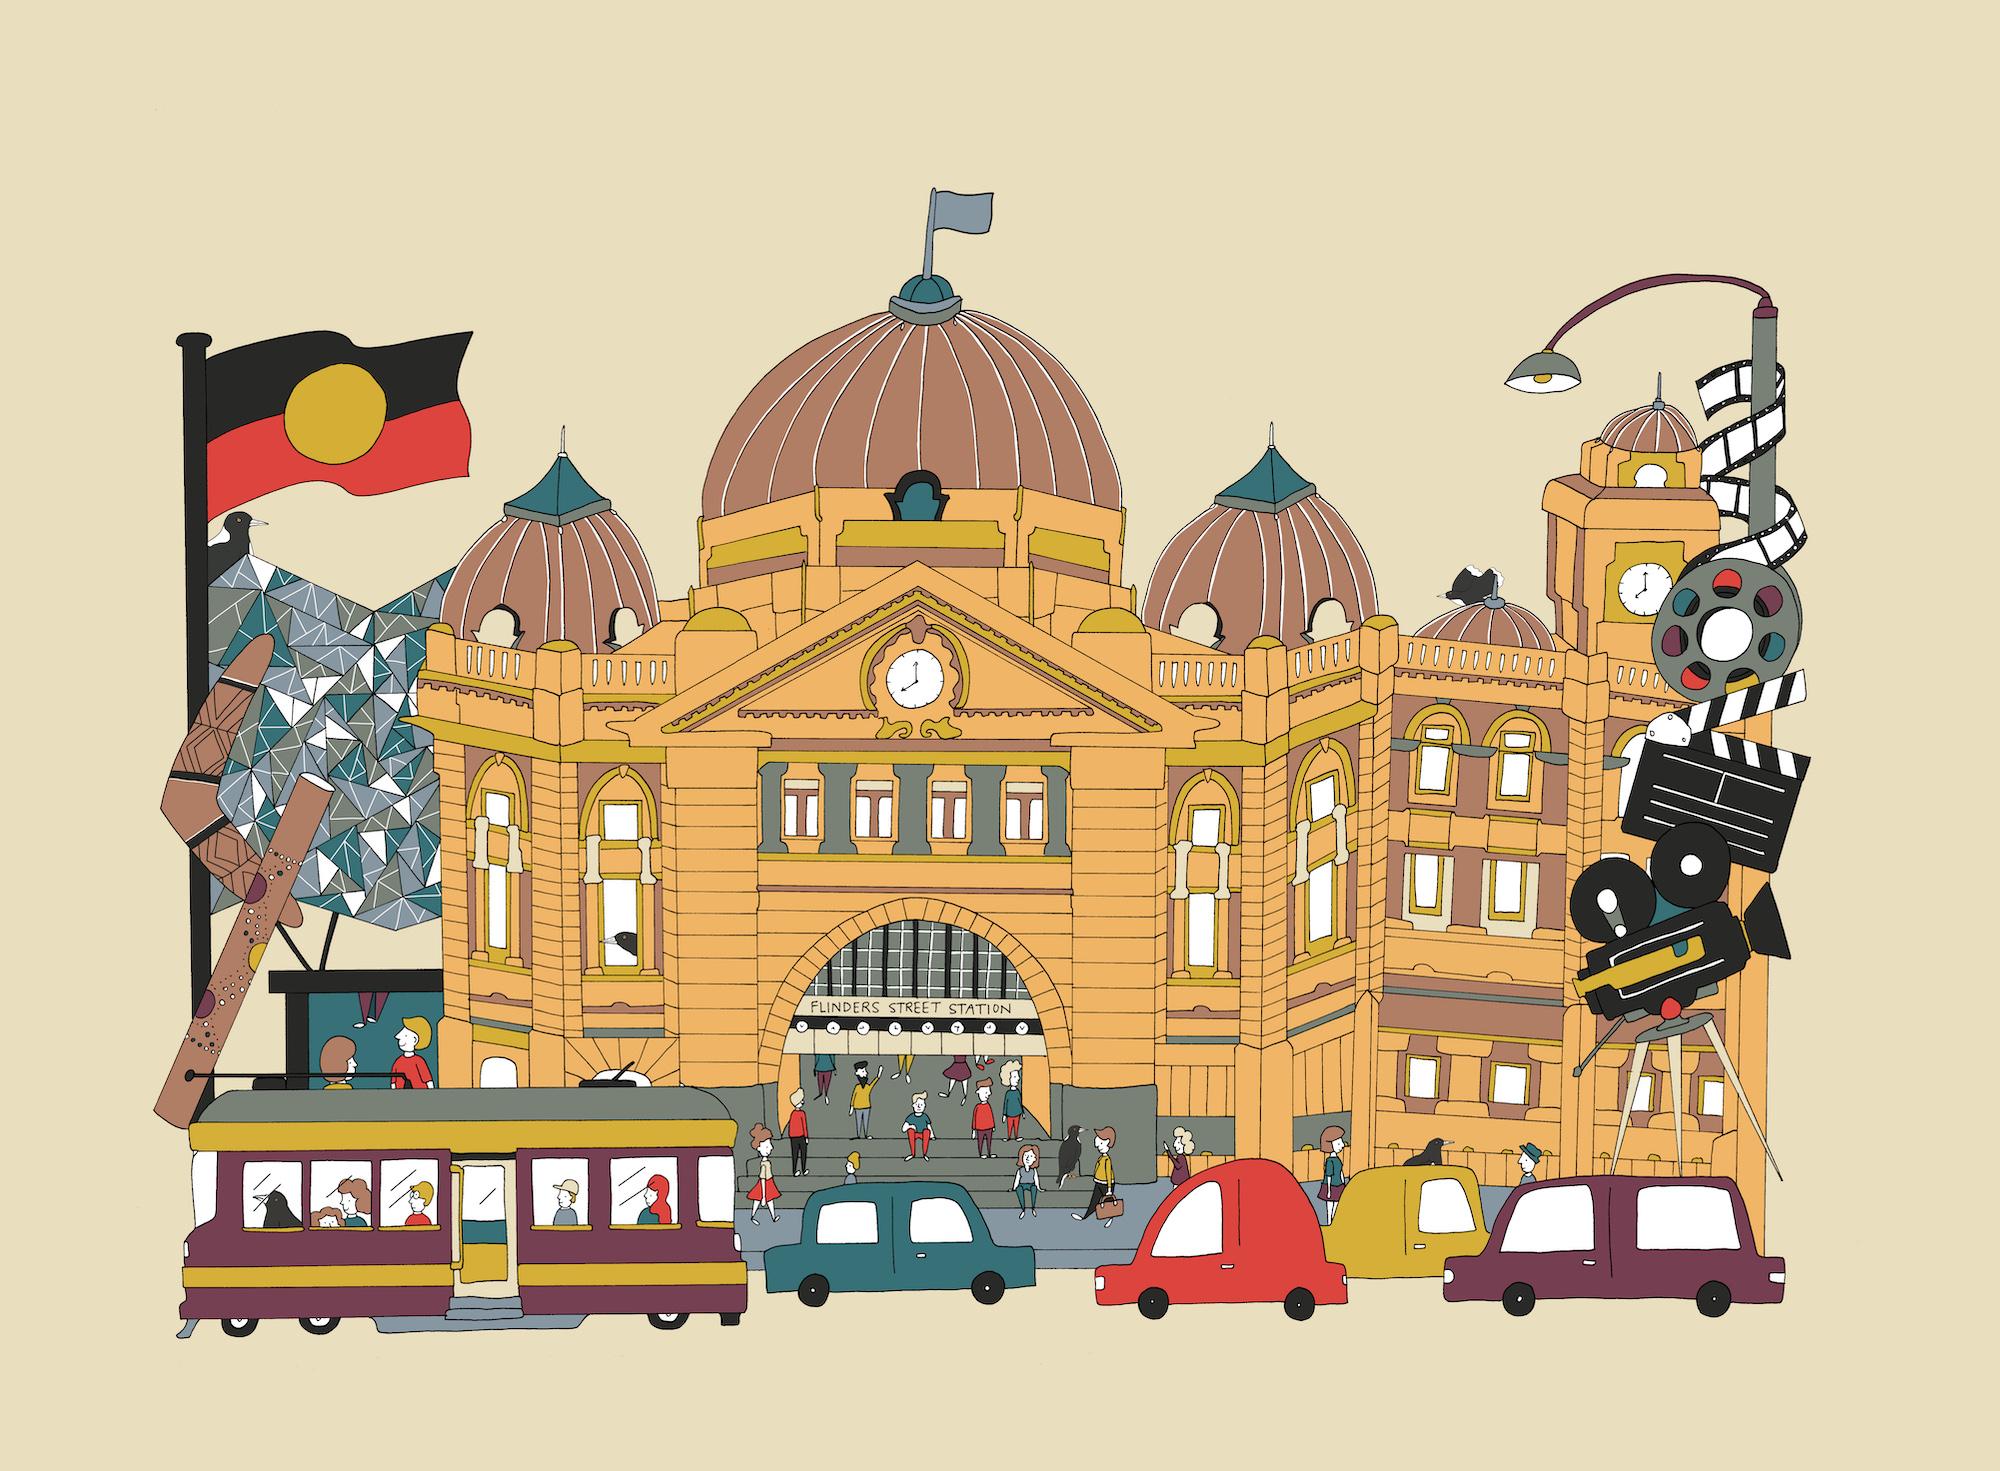 MeganMcKean_illustration_FlindersSt.jpg